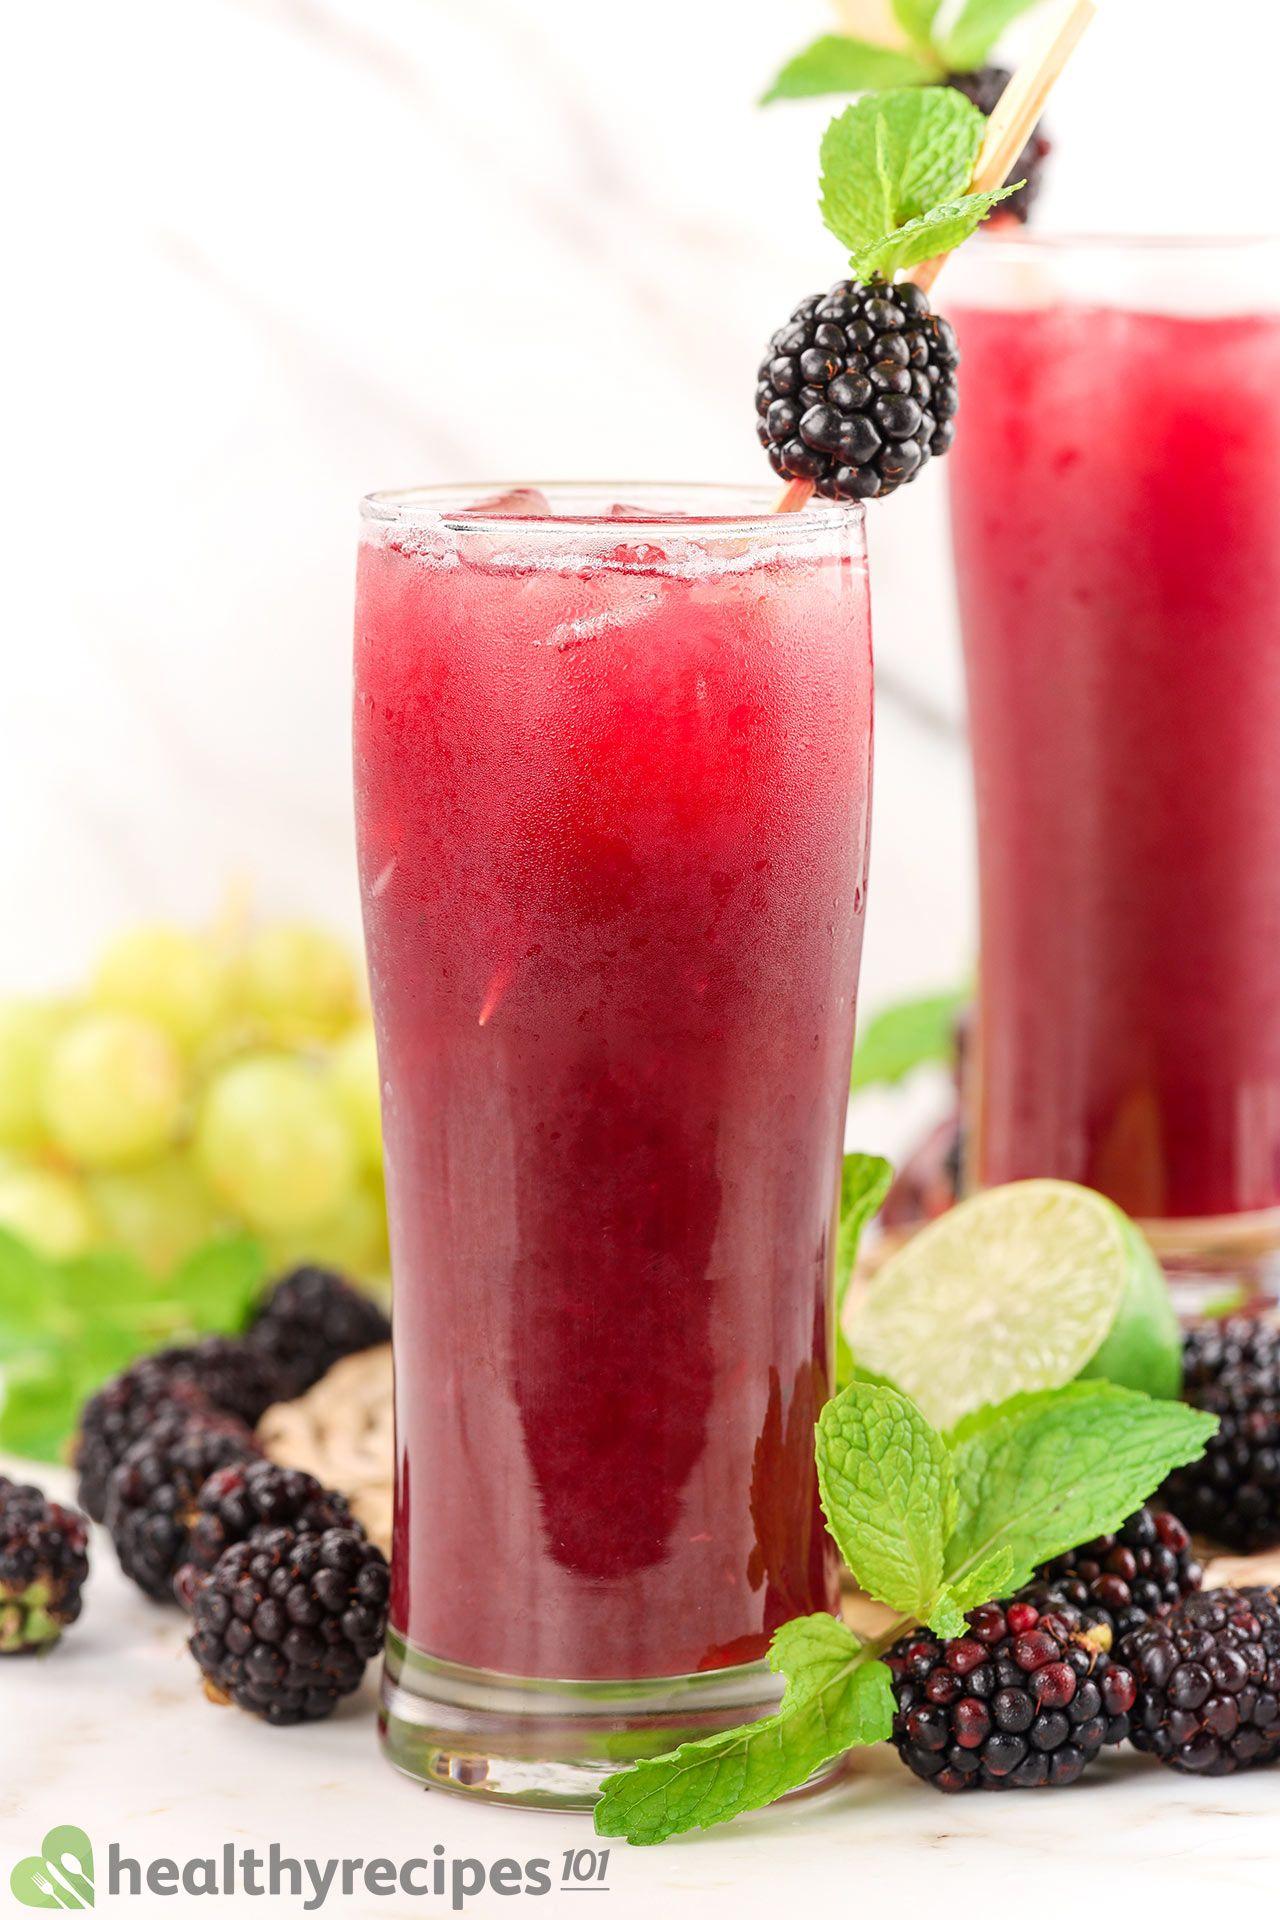 homemade blackberry juice recipe